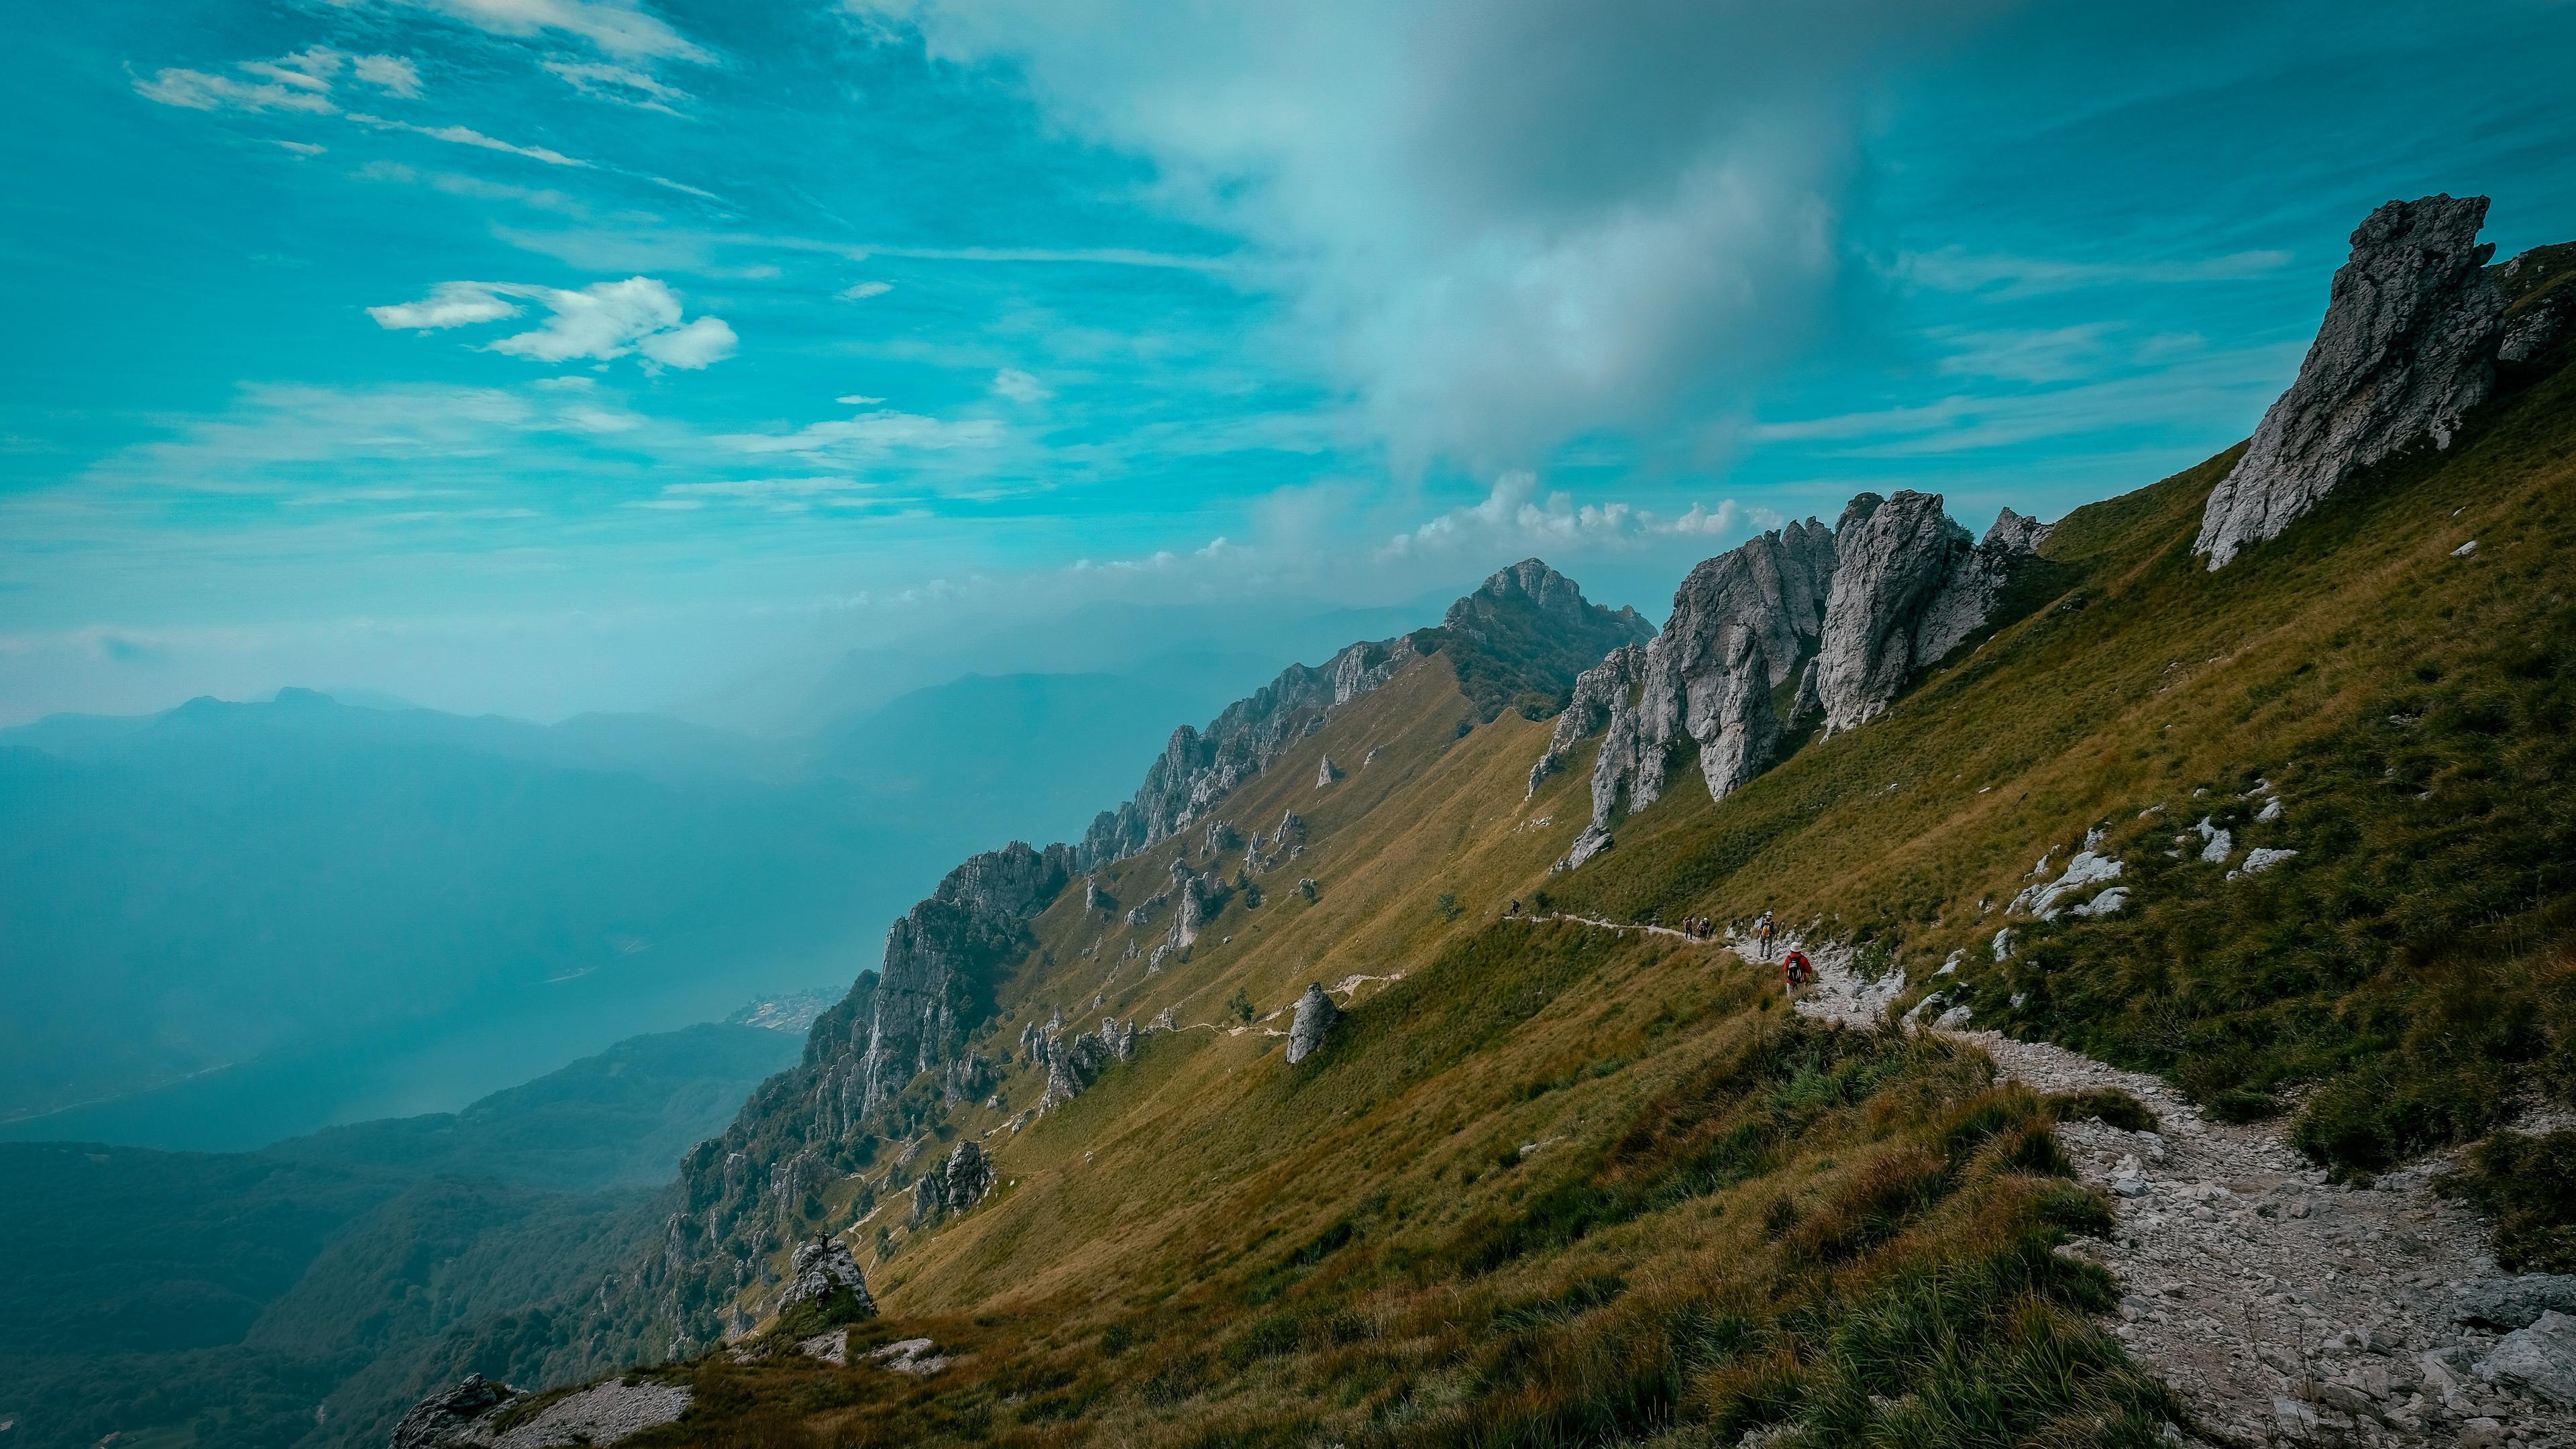 mountains path rocks stones top sky grass 4k 1541117323 - mountains, path, rocks, stones, top, sky, grass 4k - Rocks, path, Mountains